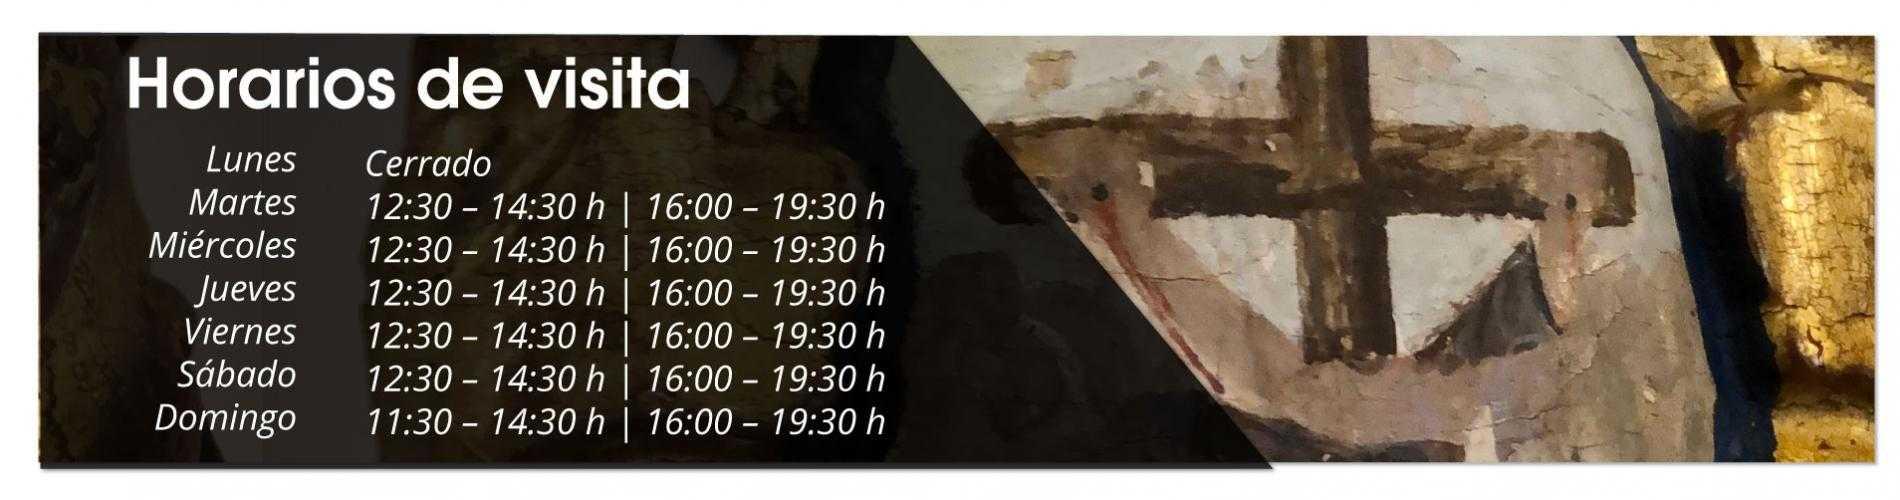 convento imagen horarios